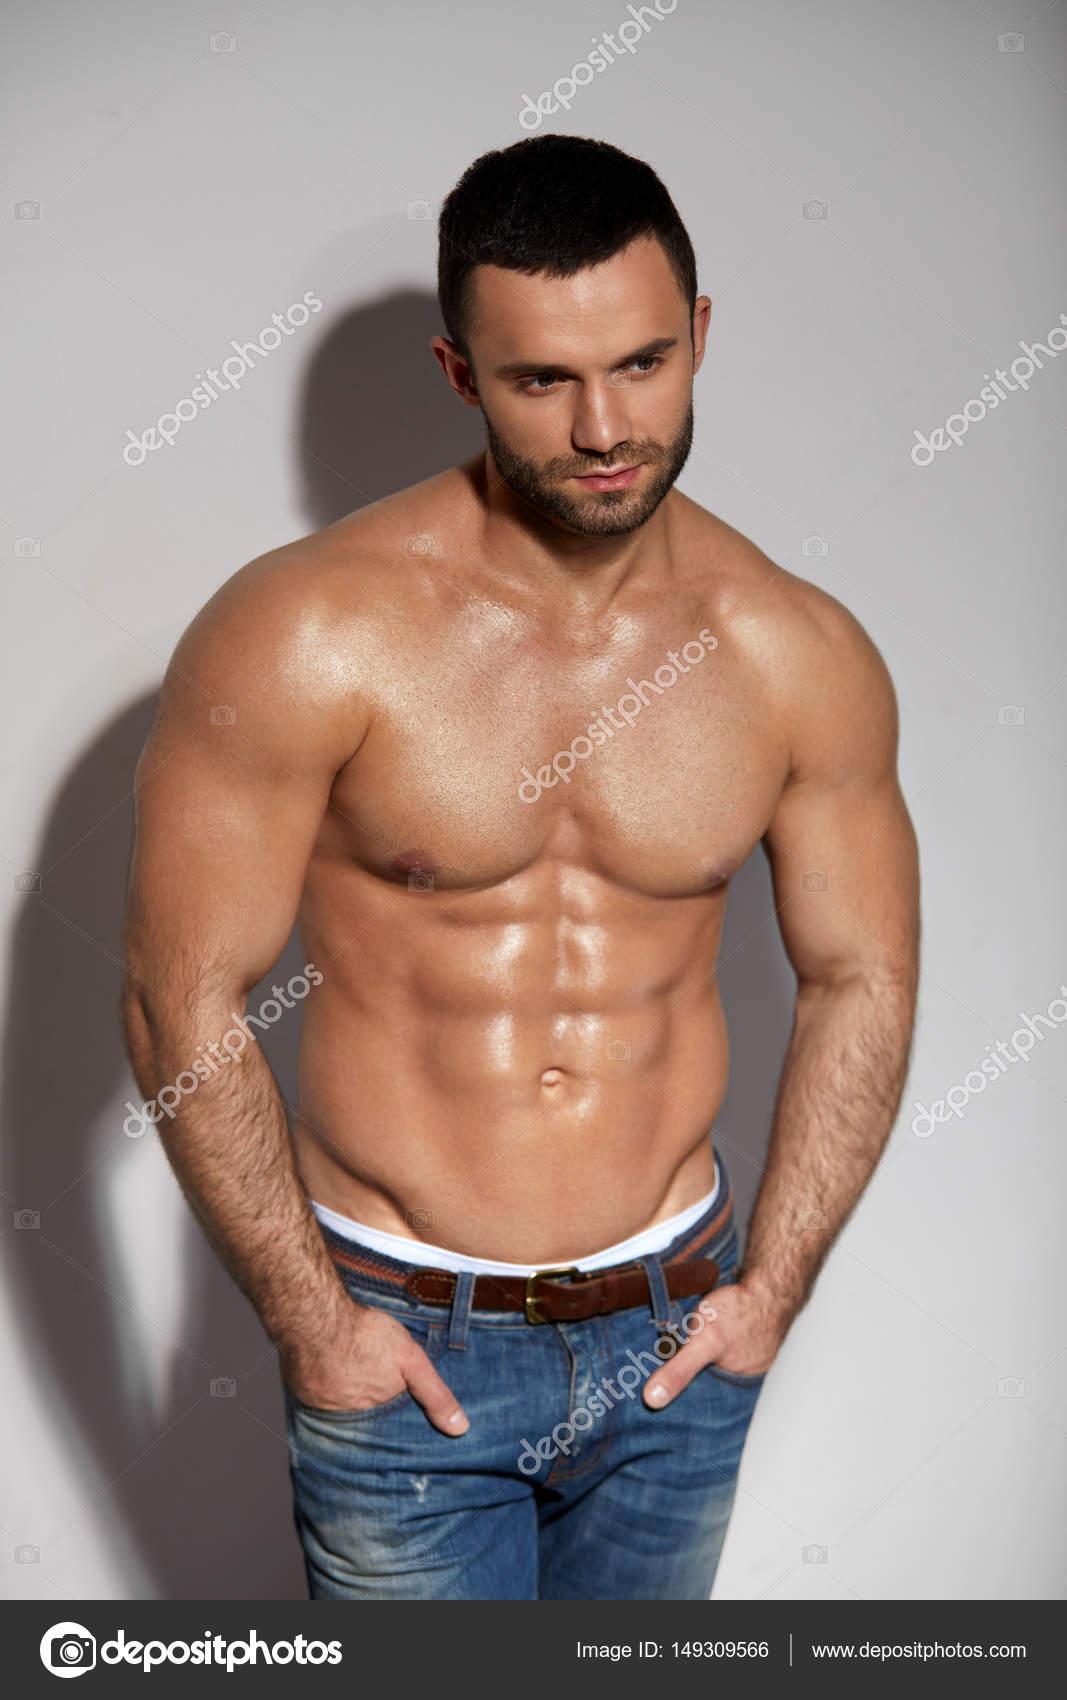 Naked model sexy hot man